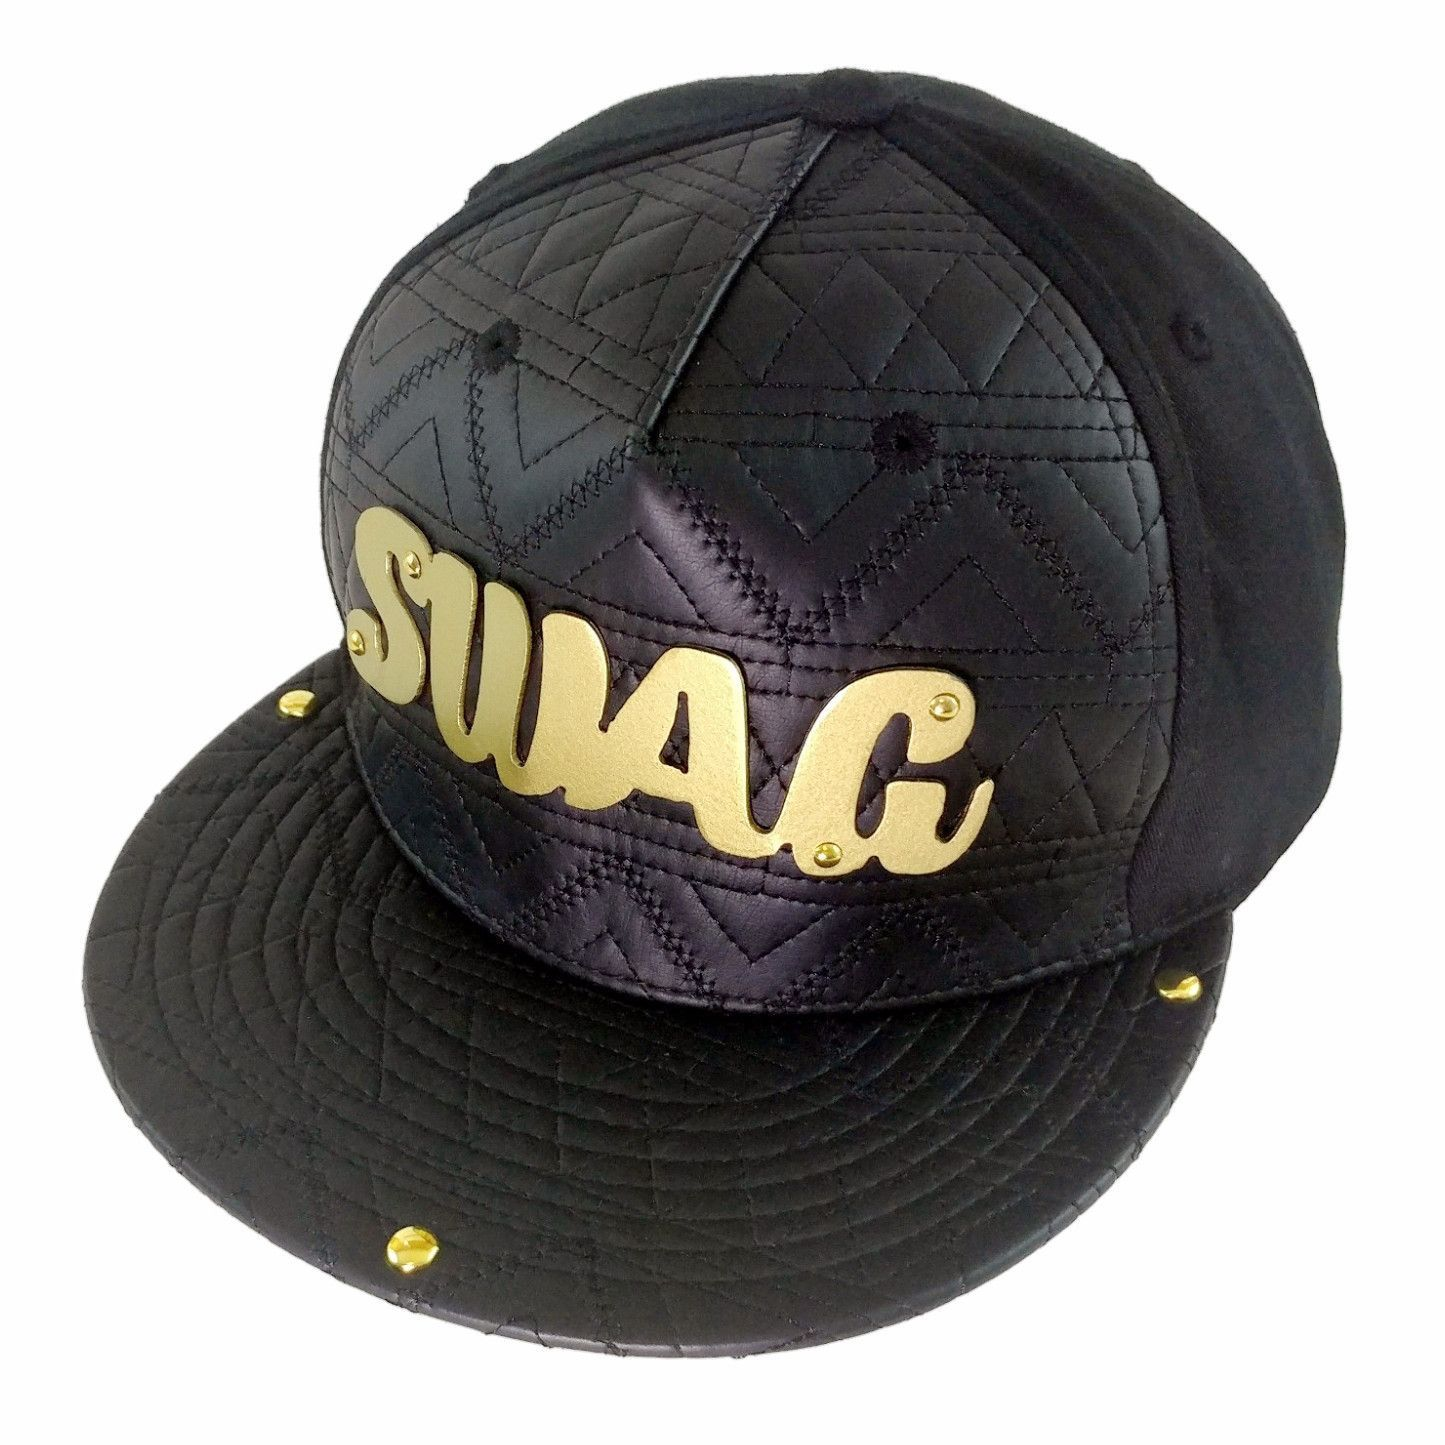 35e416e6fd0ea ... reduced swag gold or silver metal plate black mixed leather snapback  baseball cap ff1e1 ae7af